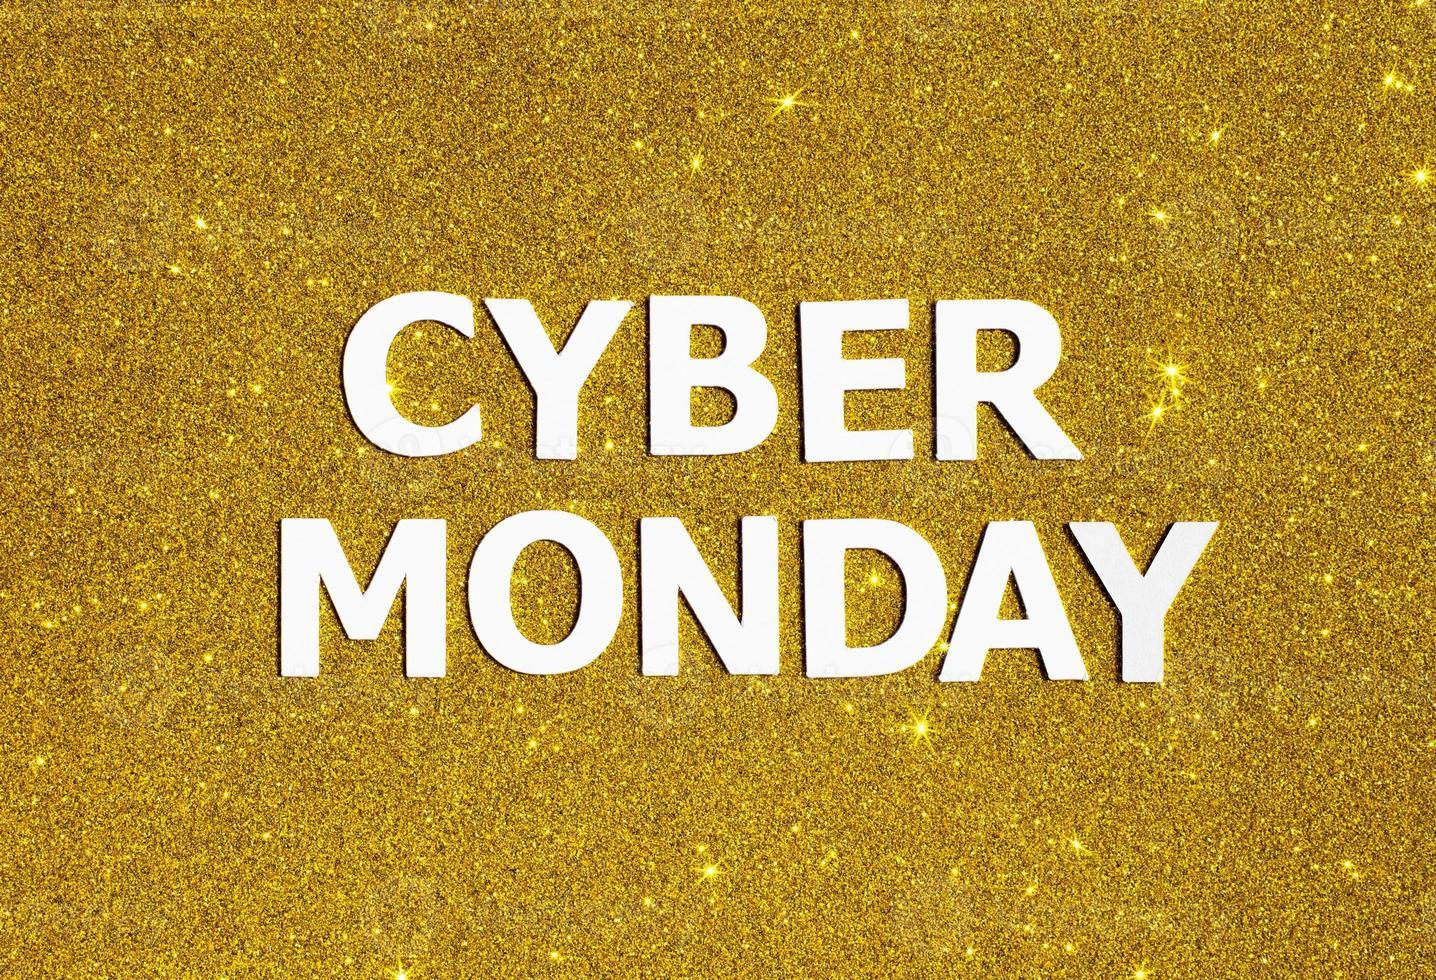 Top view golden glitter cyber Monday photo